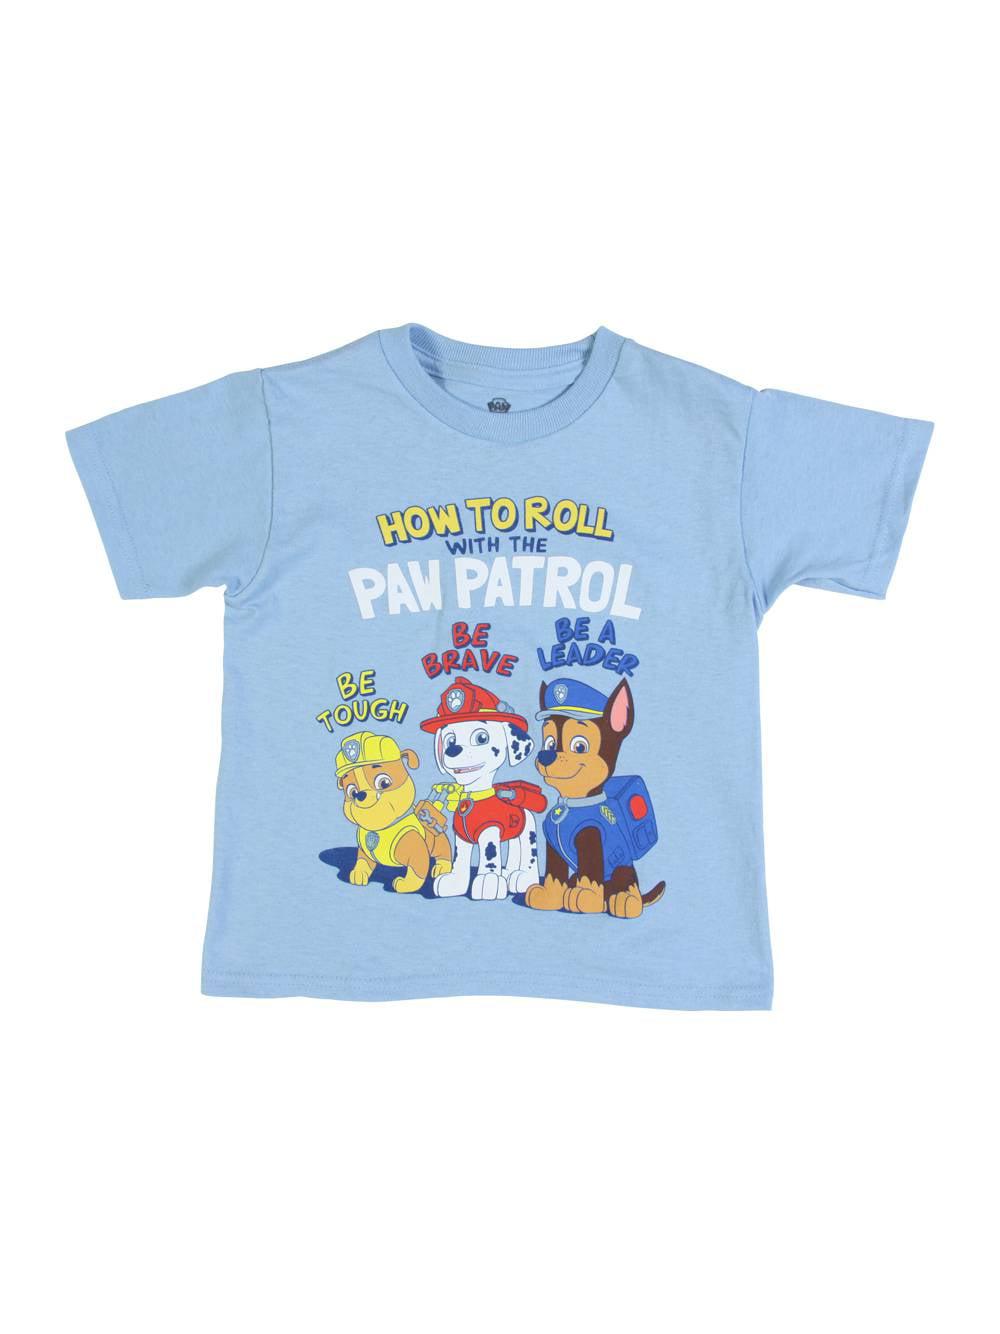 Paw Patrol Toddler Short Sleeve T-Shirt, Sky Blue